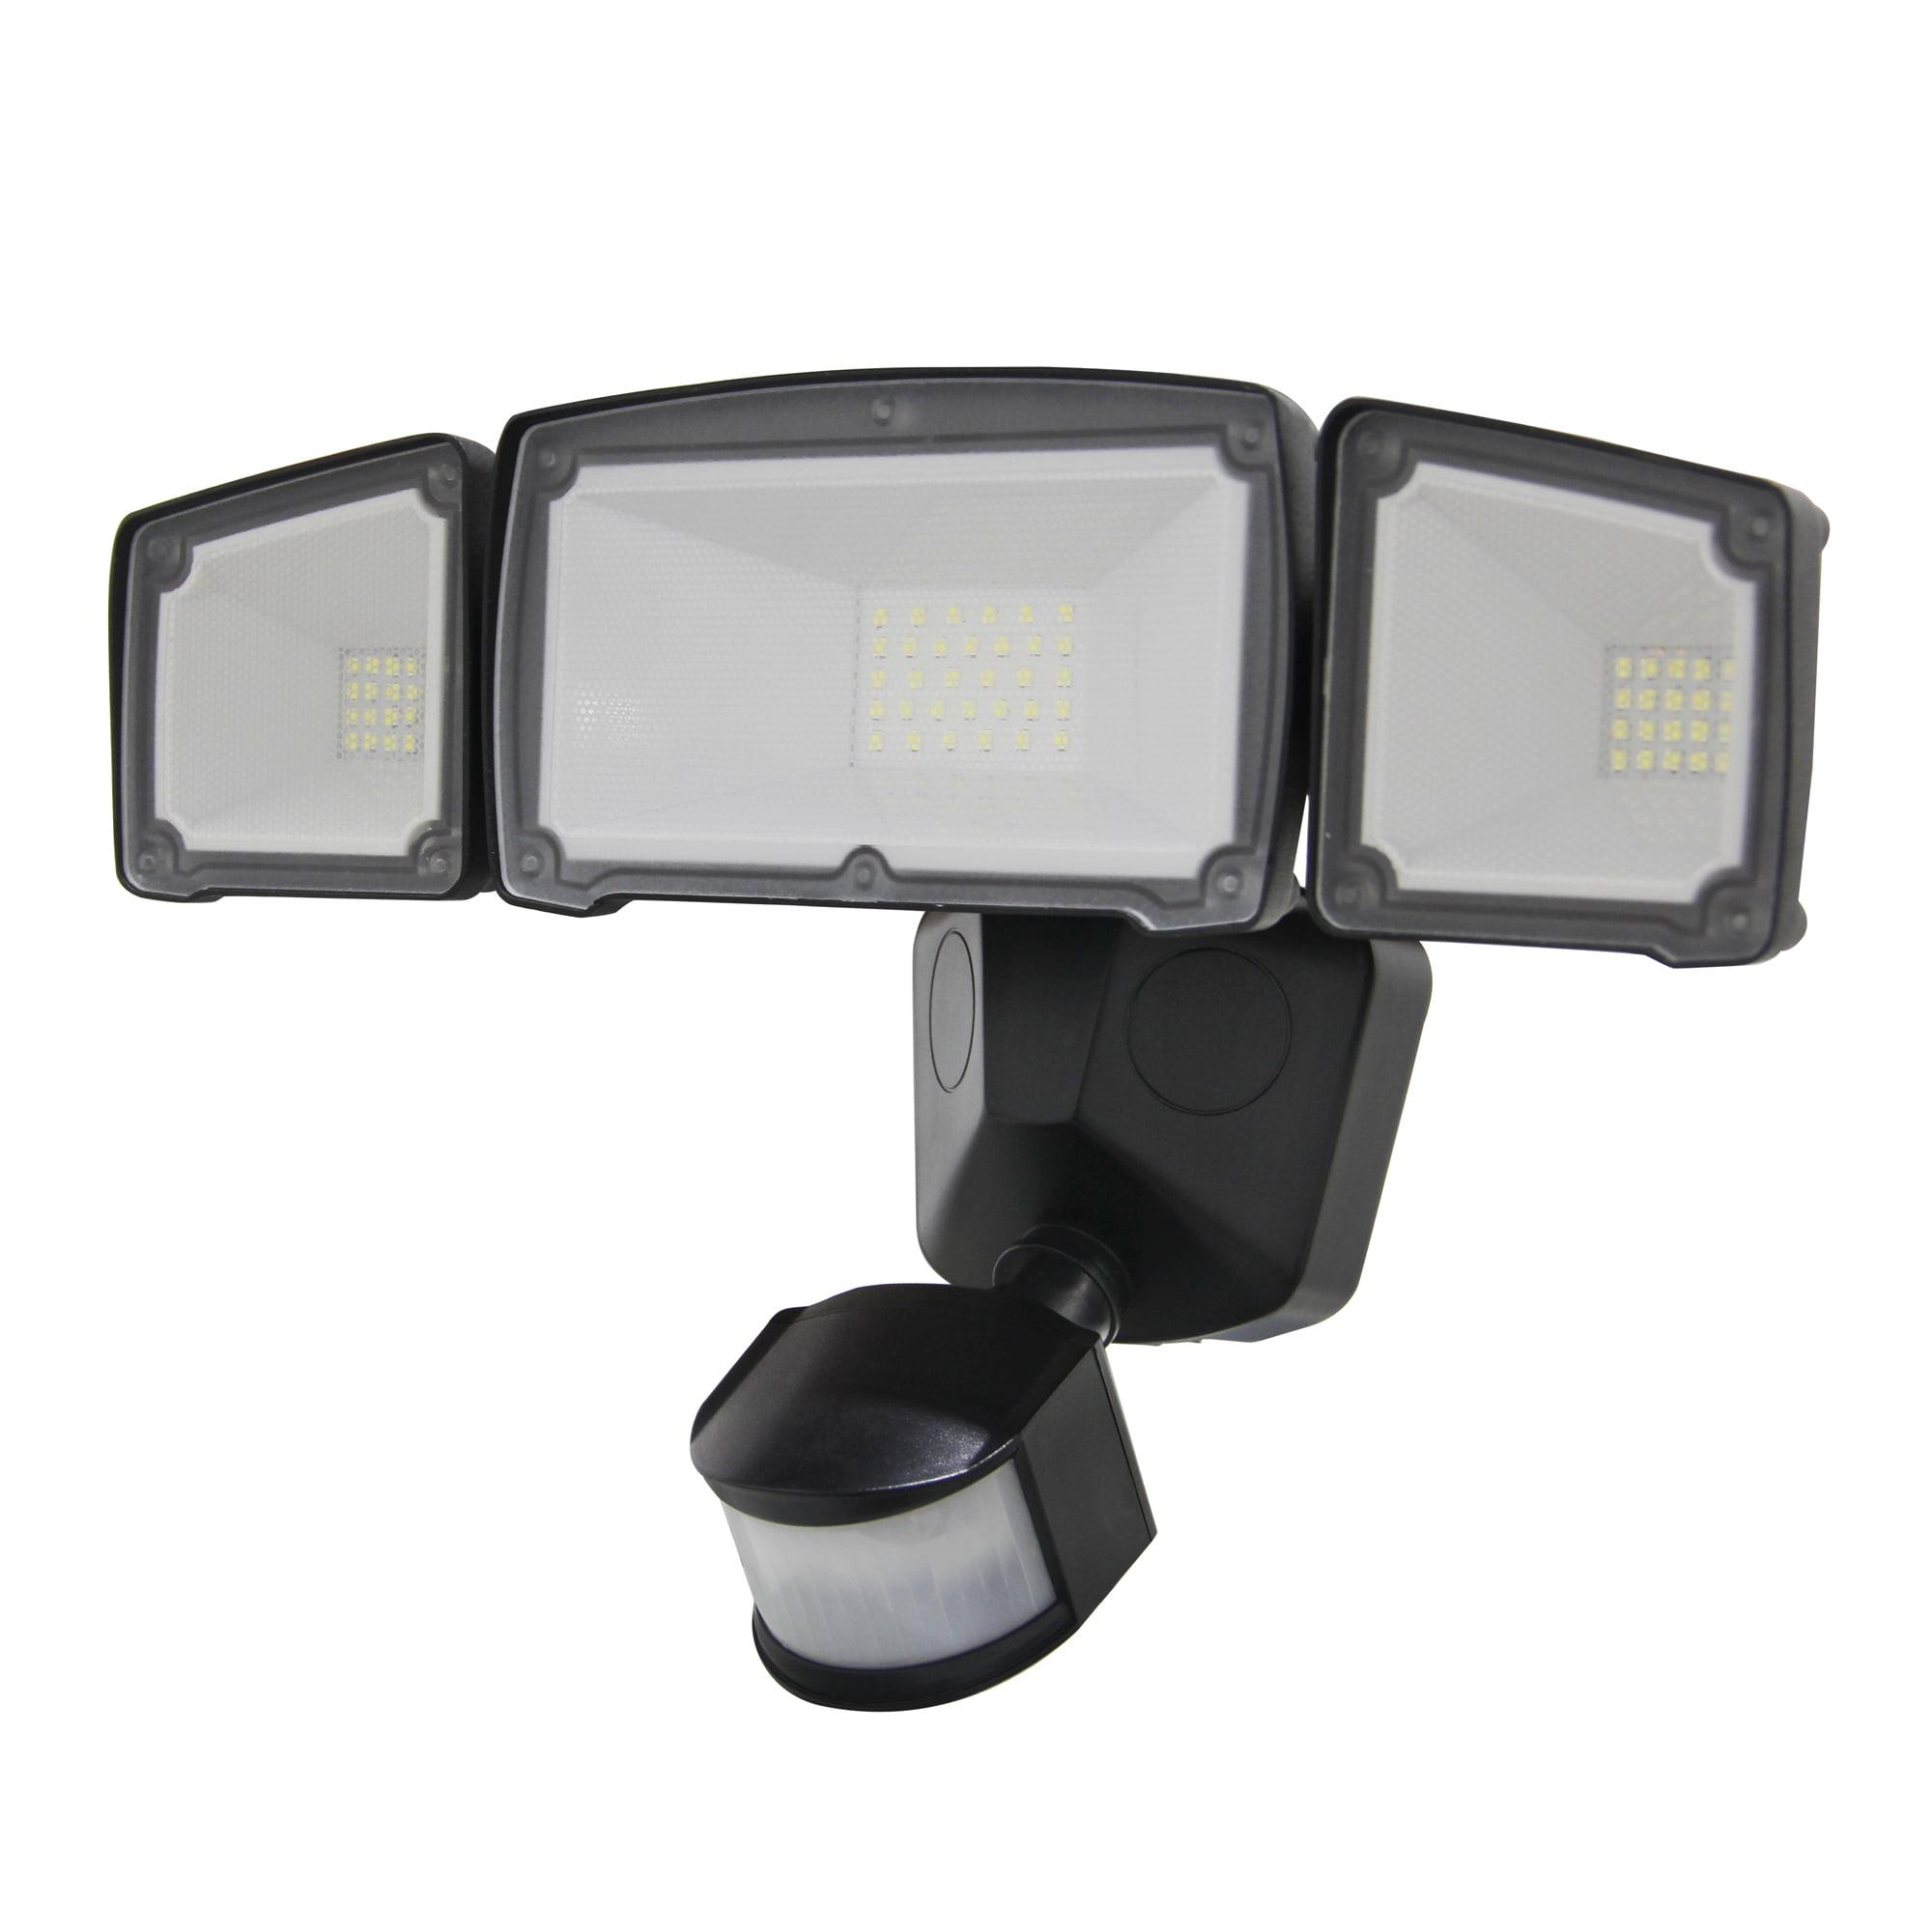 Luxworx Wide Angle Three Head Solar Powered Outdoor Led Motion Sensor Light Walmart Com Walmart Com